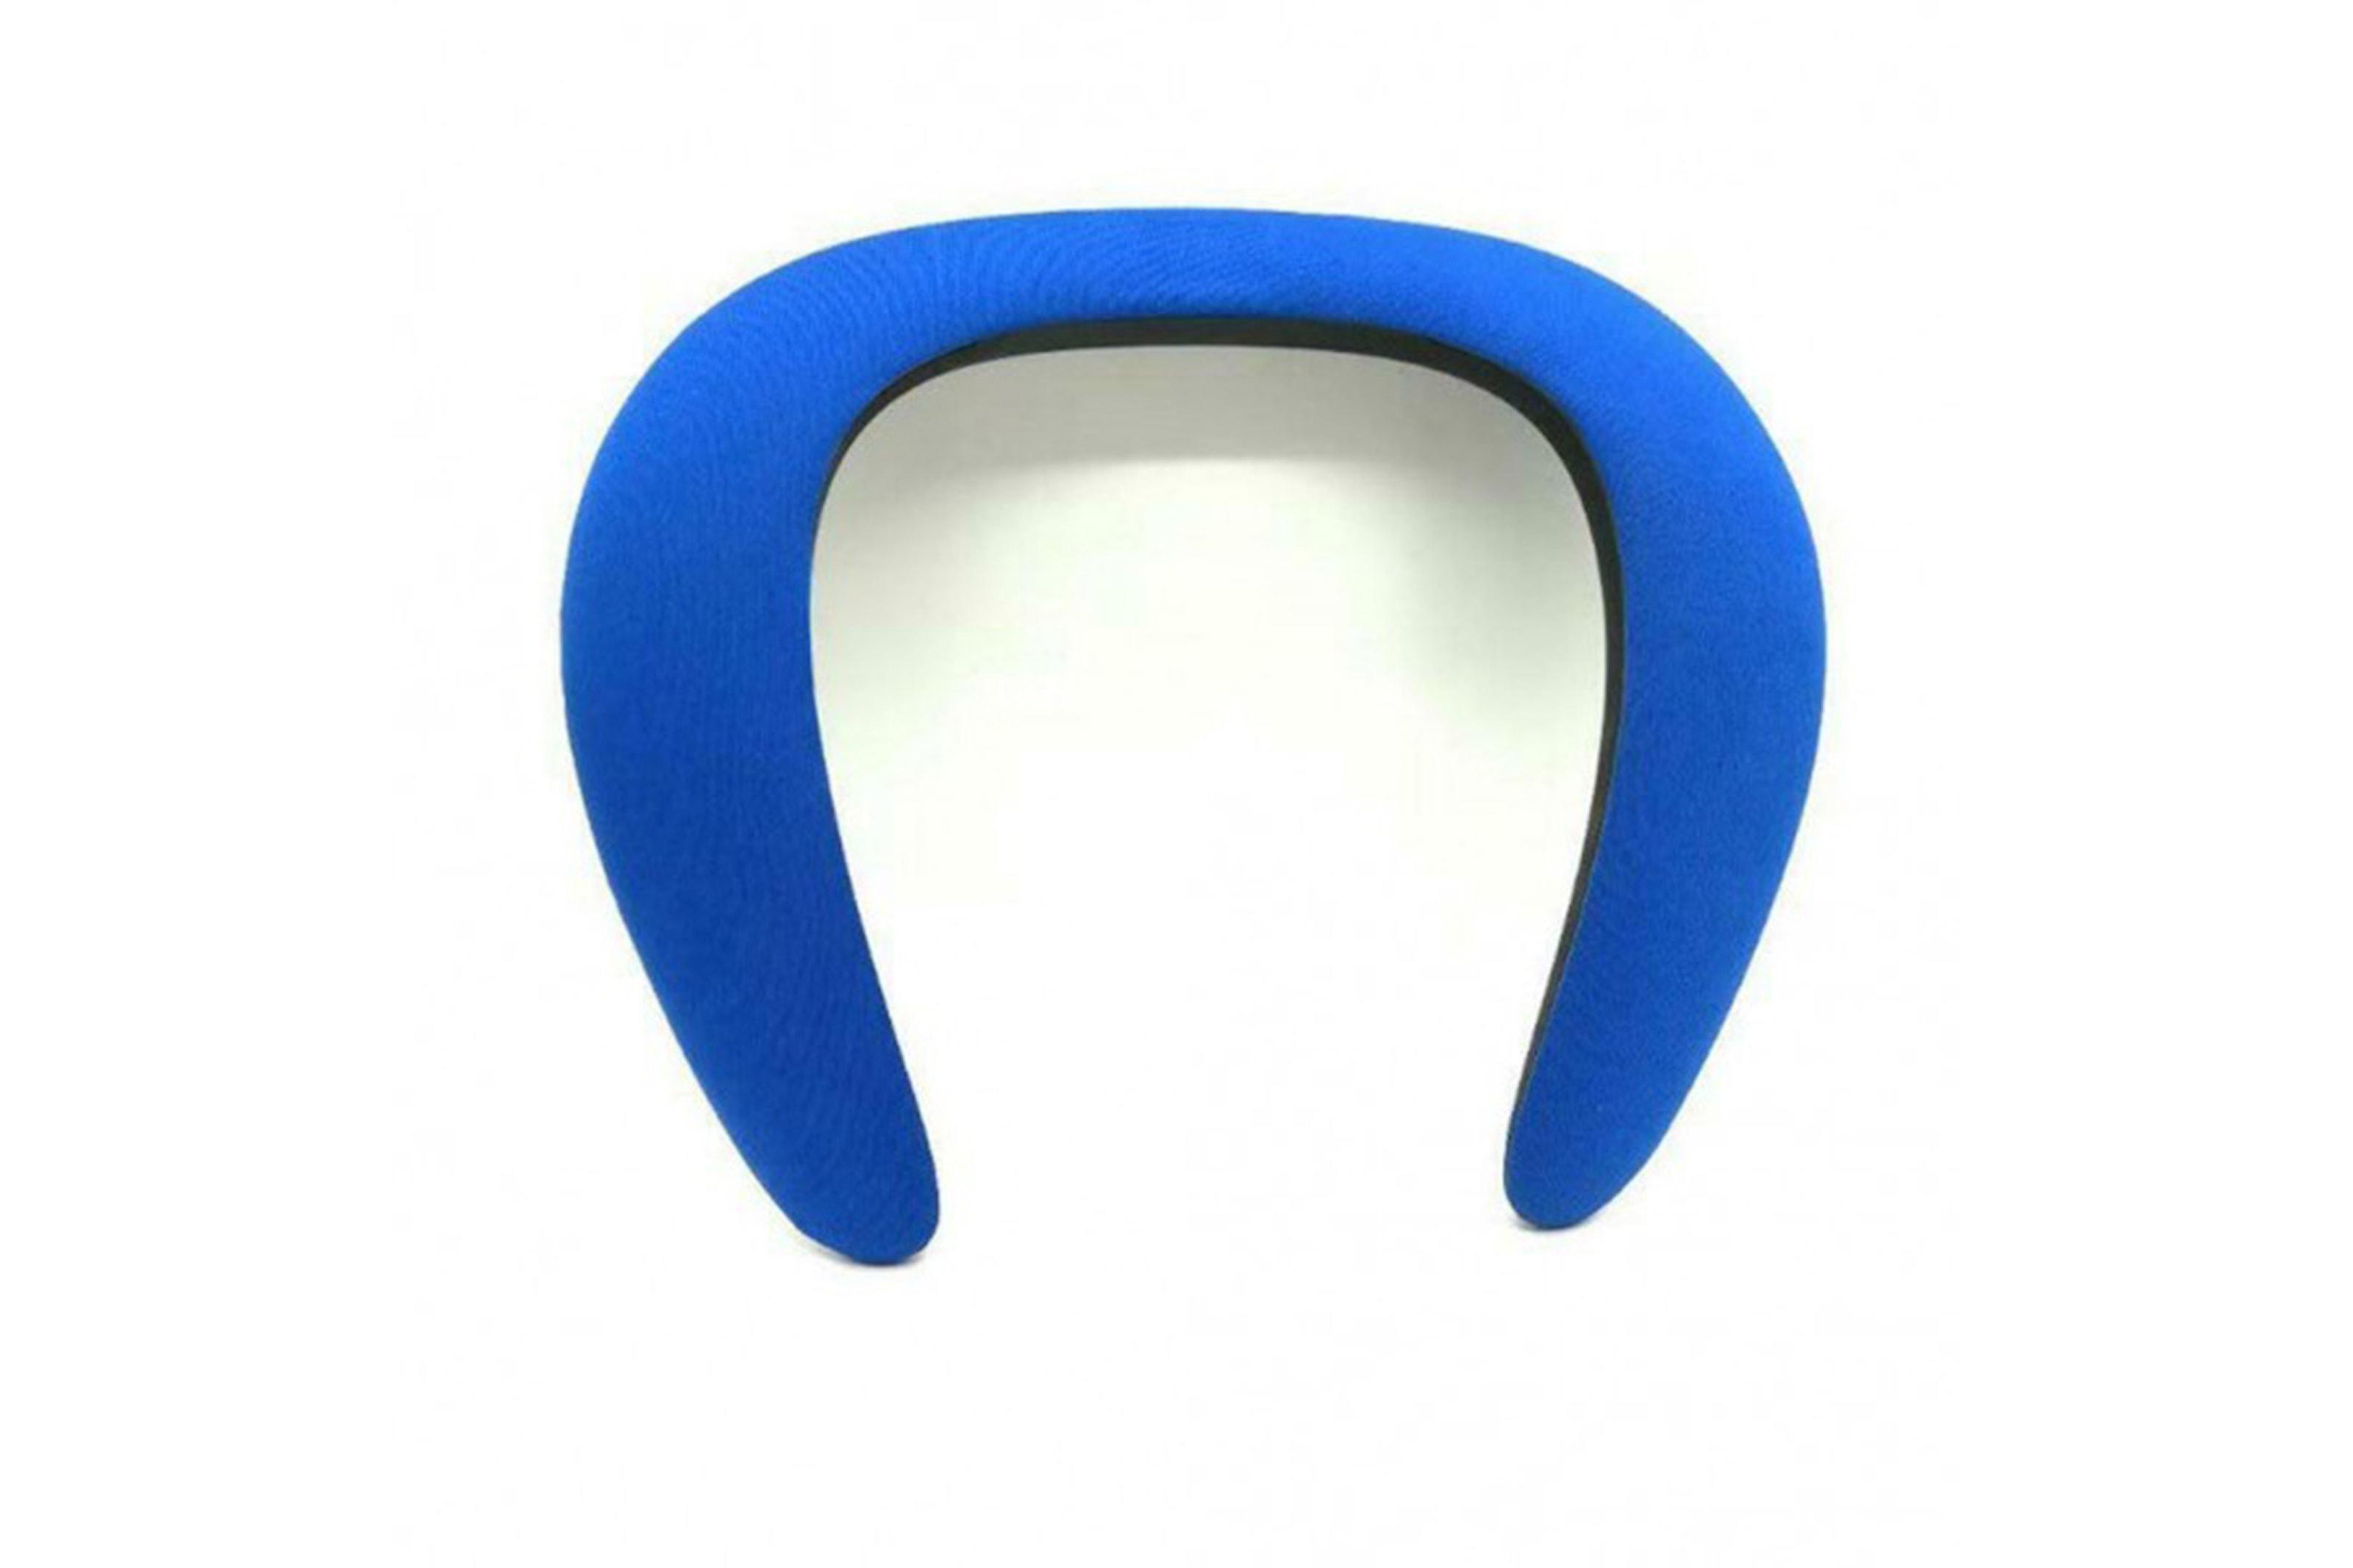 Bluetooth-högtalare för nacken